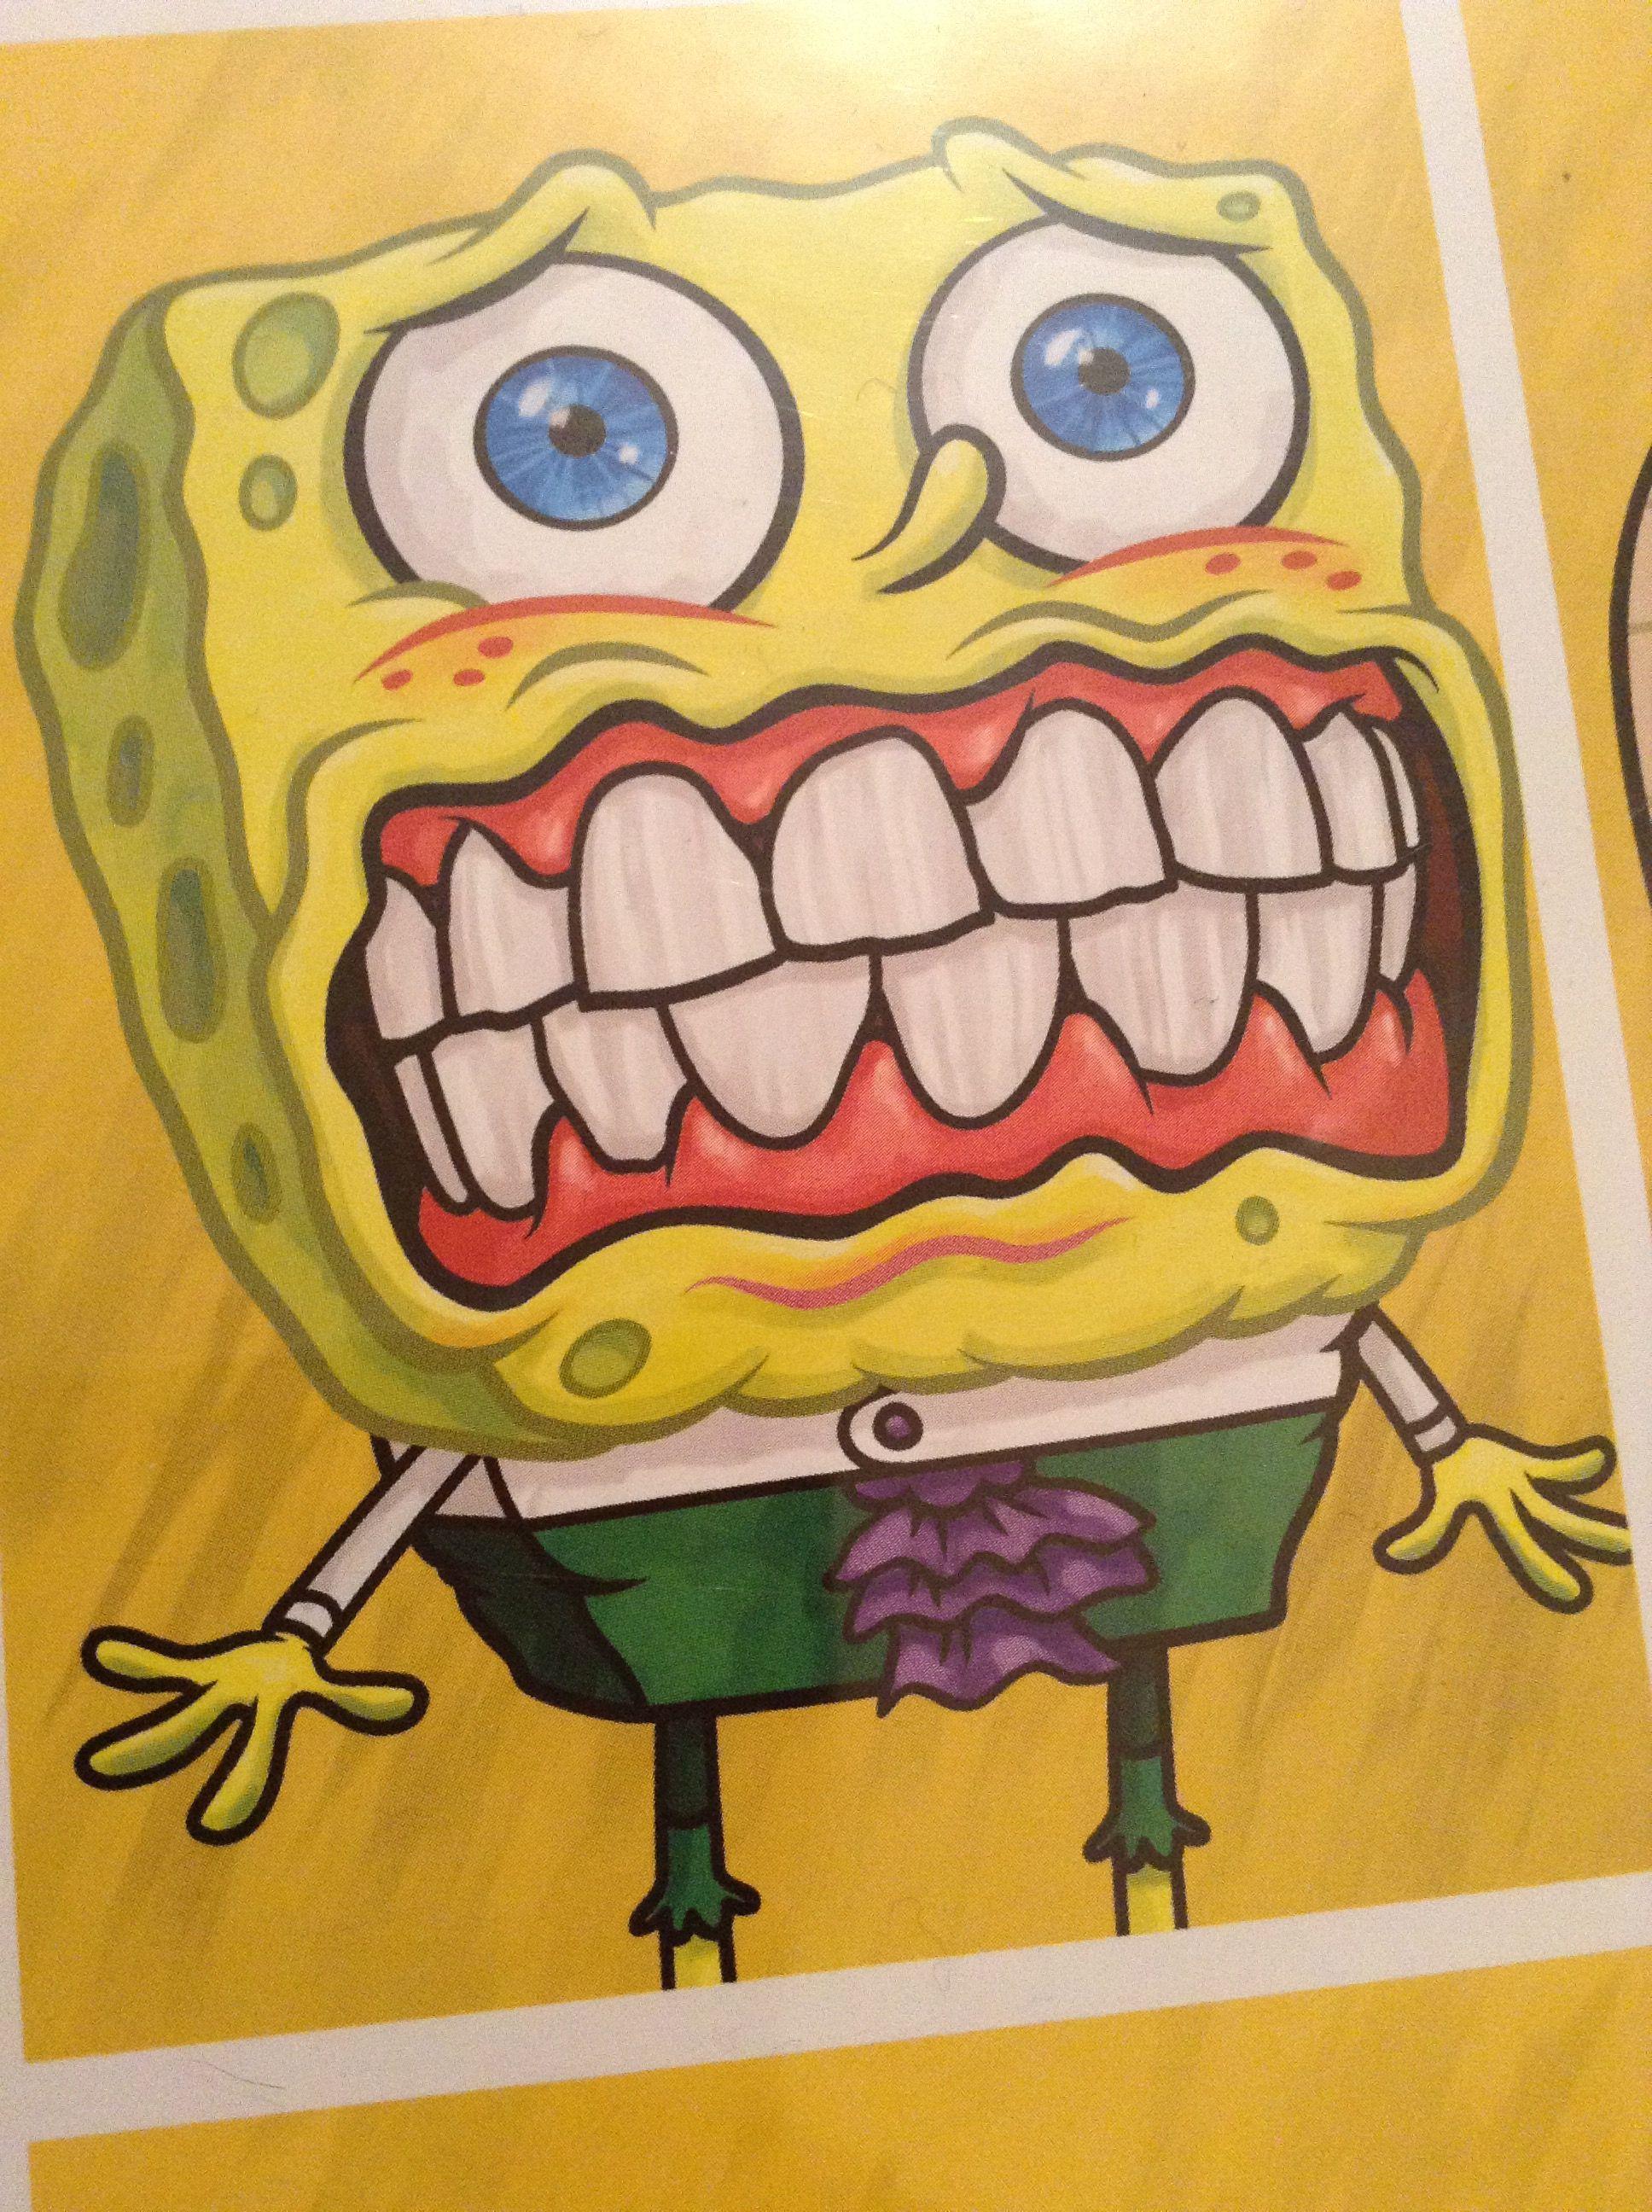 #spongebob #spongebobsquarepants